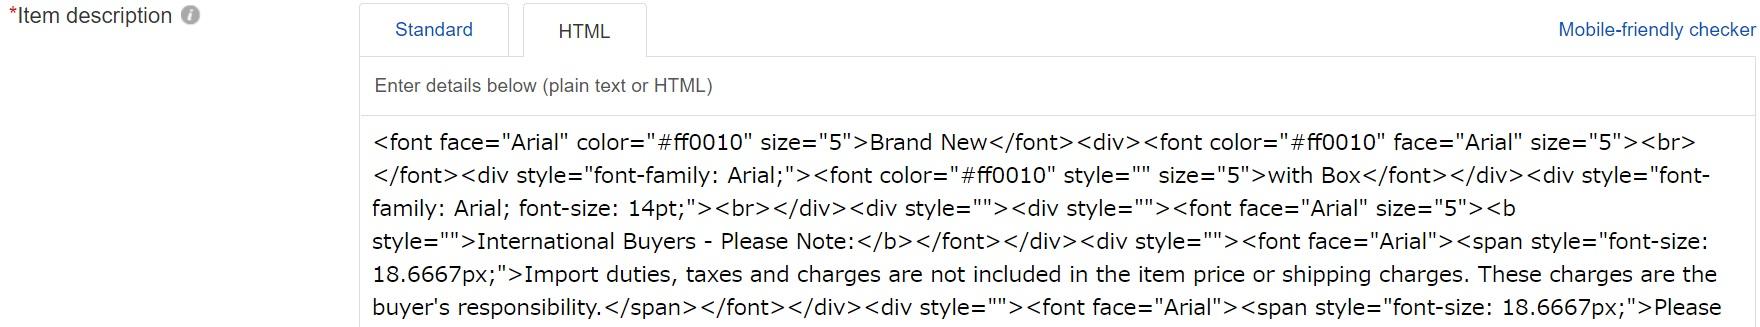 eBayのitem discription入力画面。HTML表示